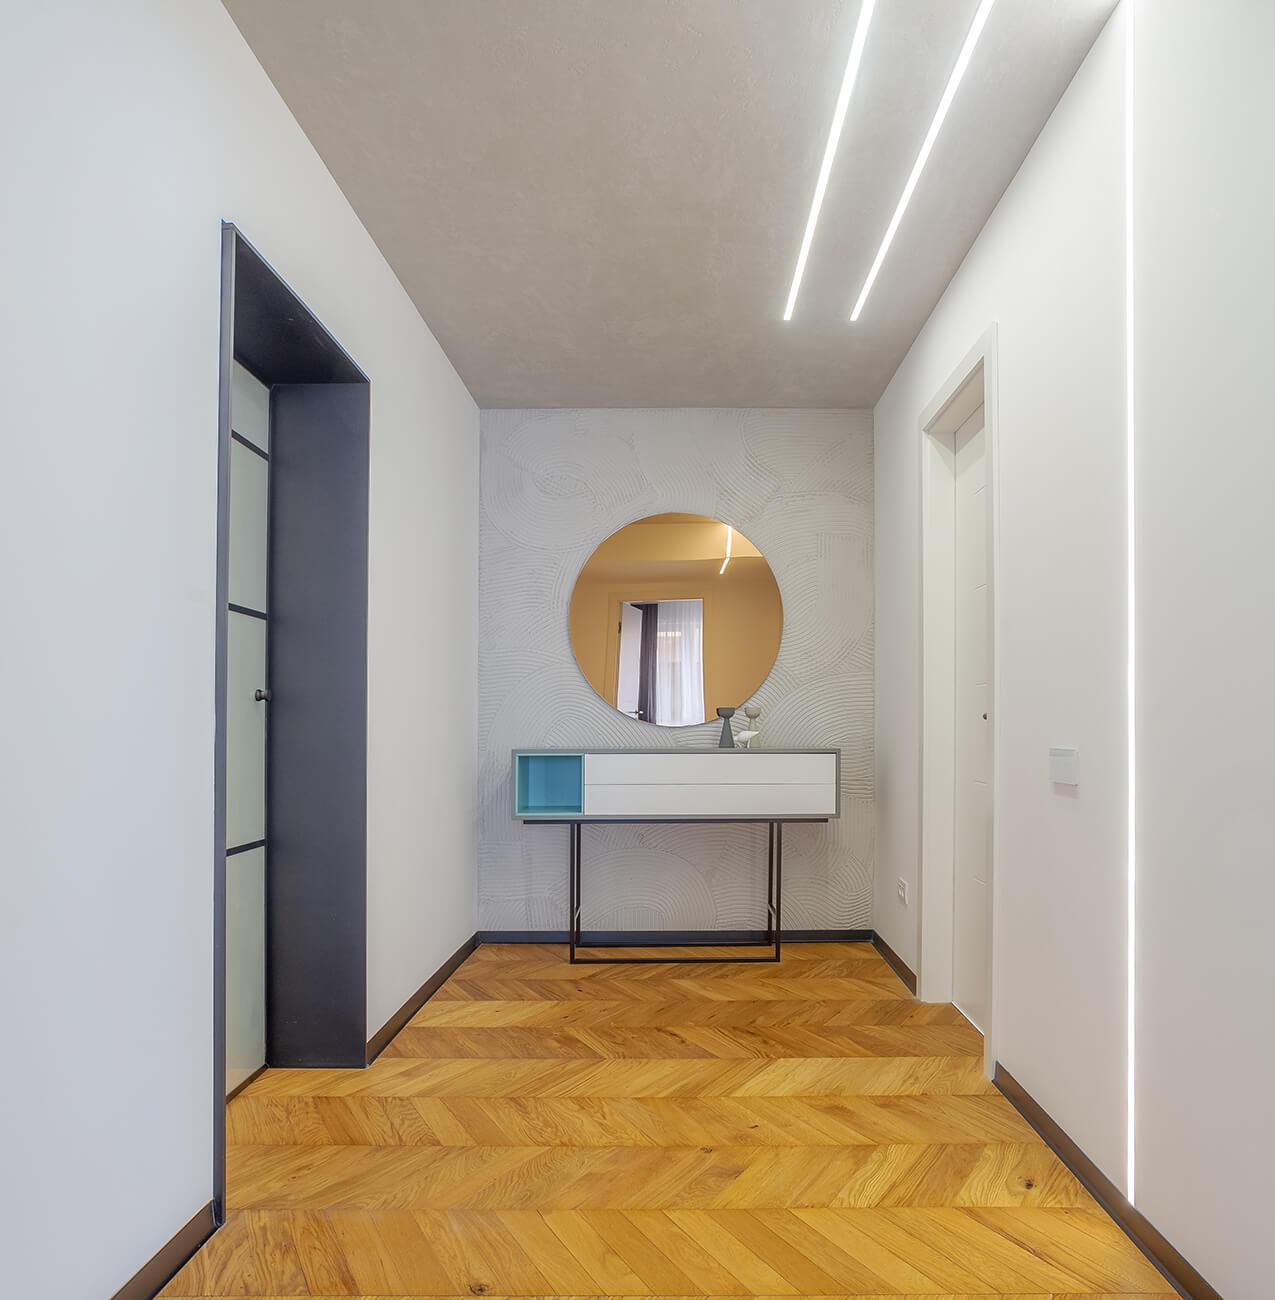 Custom made small furniture